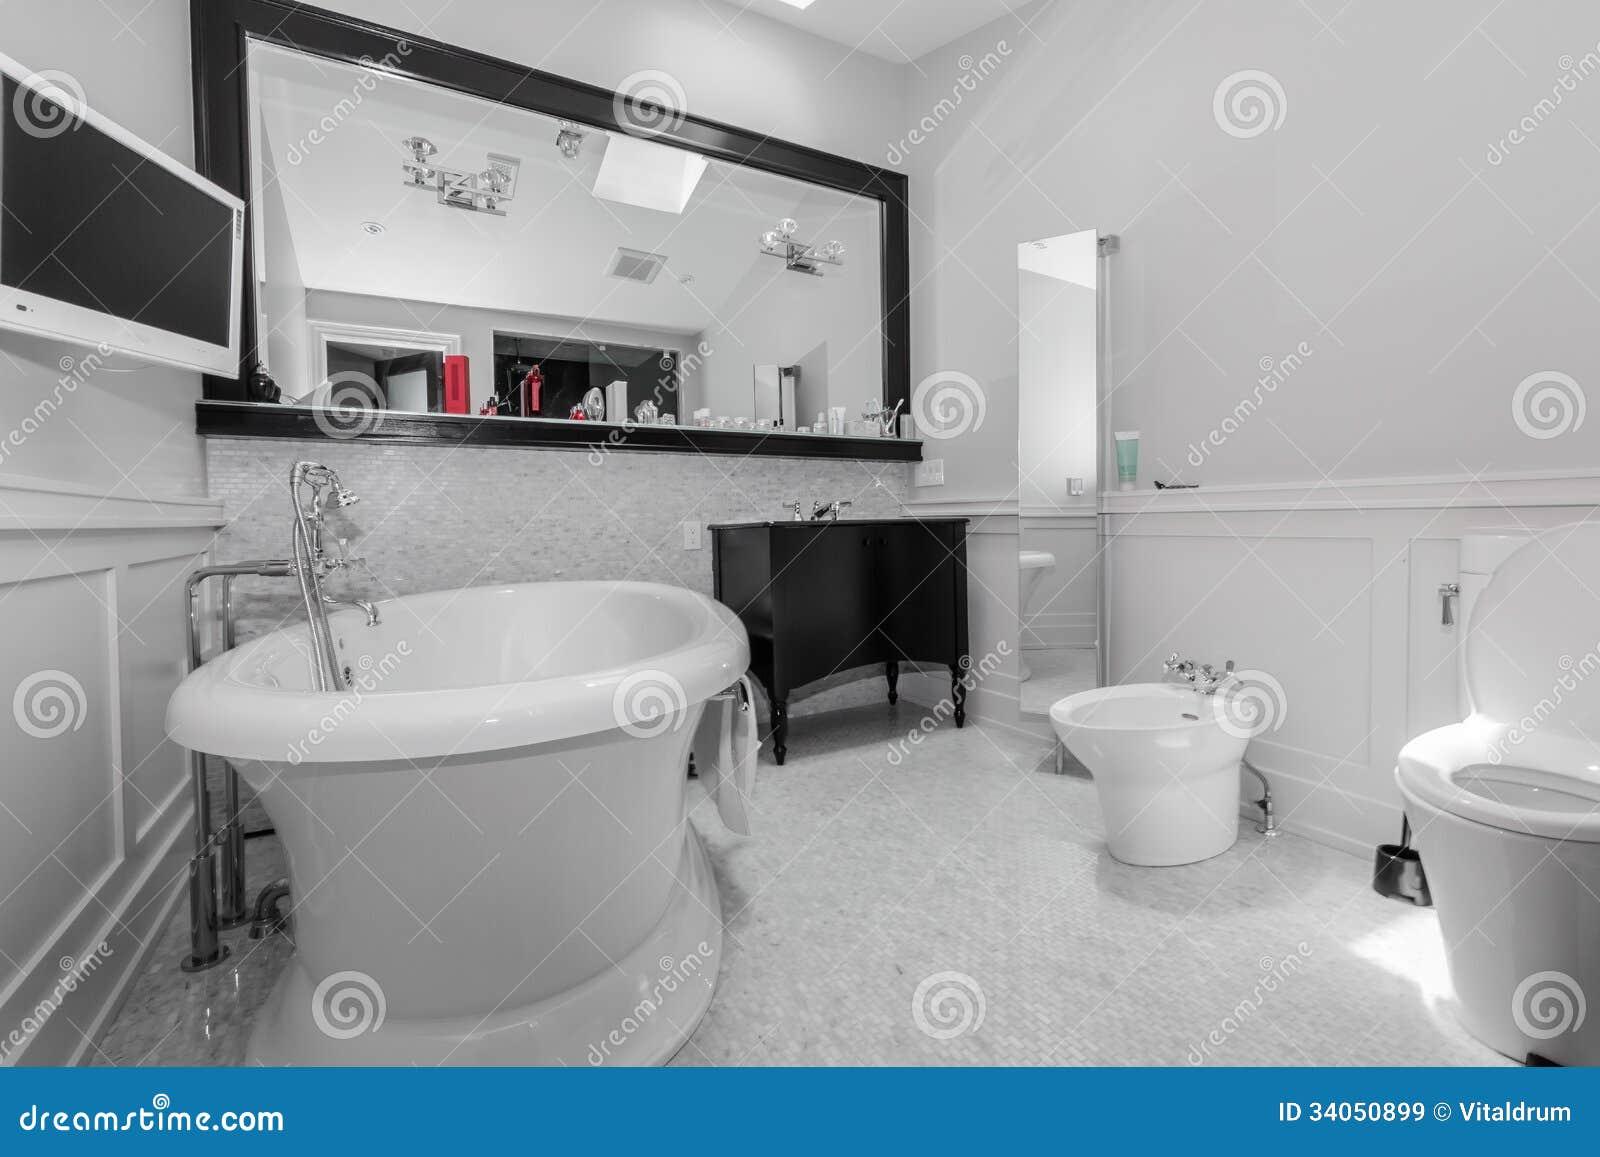 Stort stilfullt klassiskt badrum royaltyfria bilder   bild: 34050899